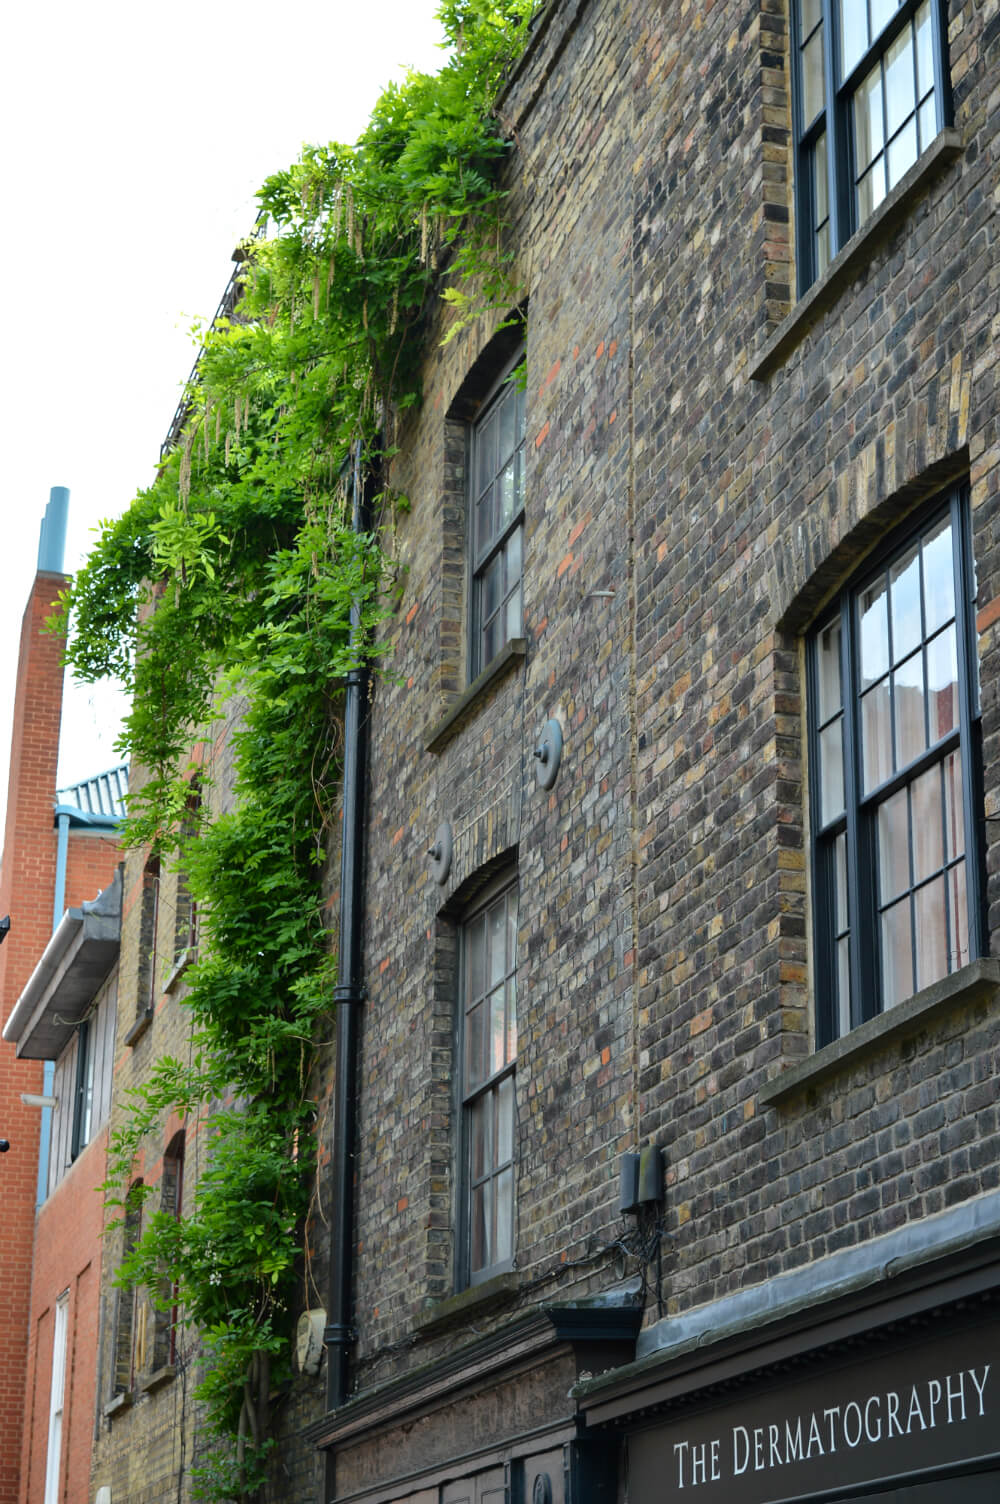 Georgian buildings in Shoreditch, London